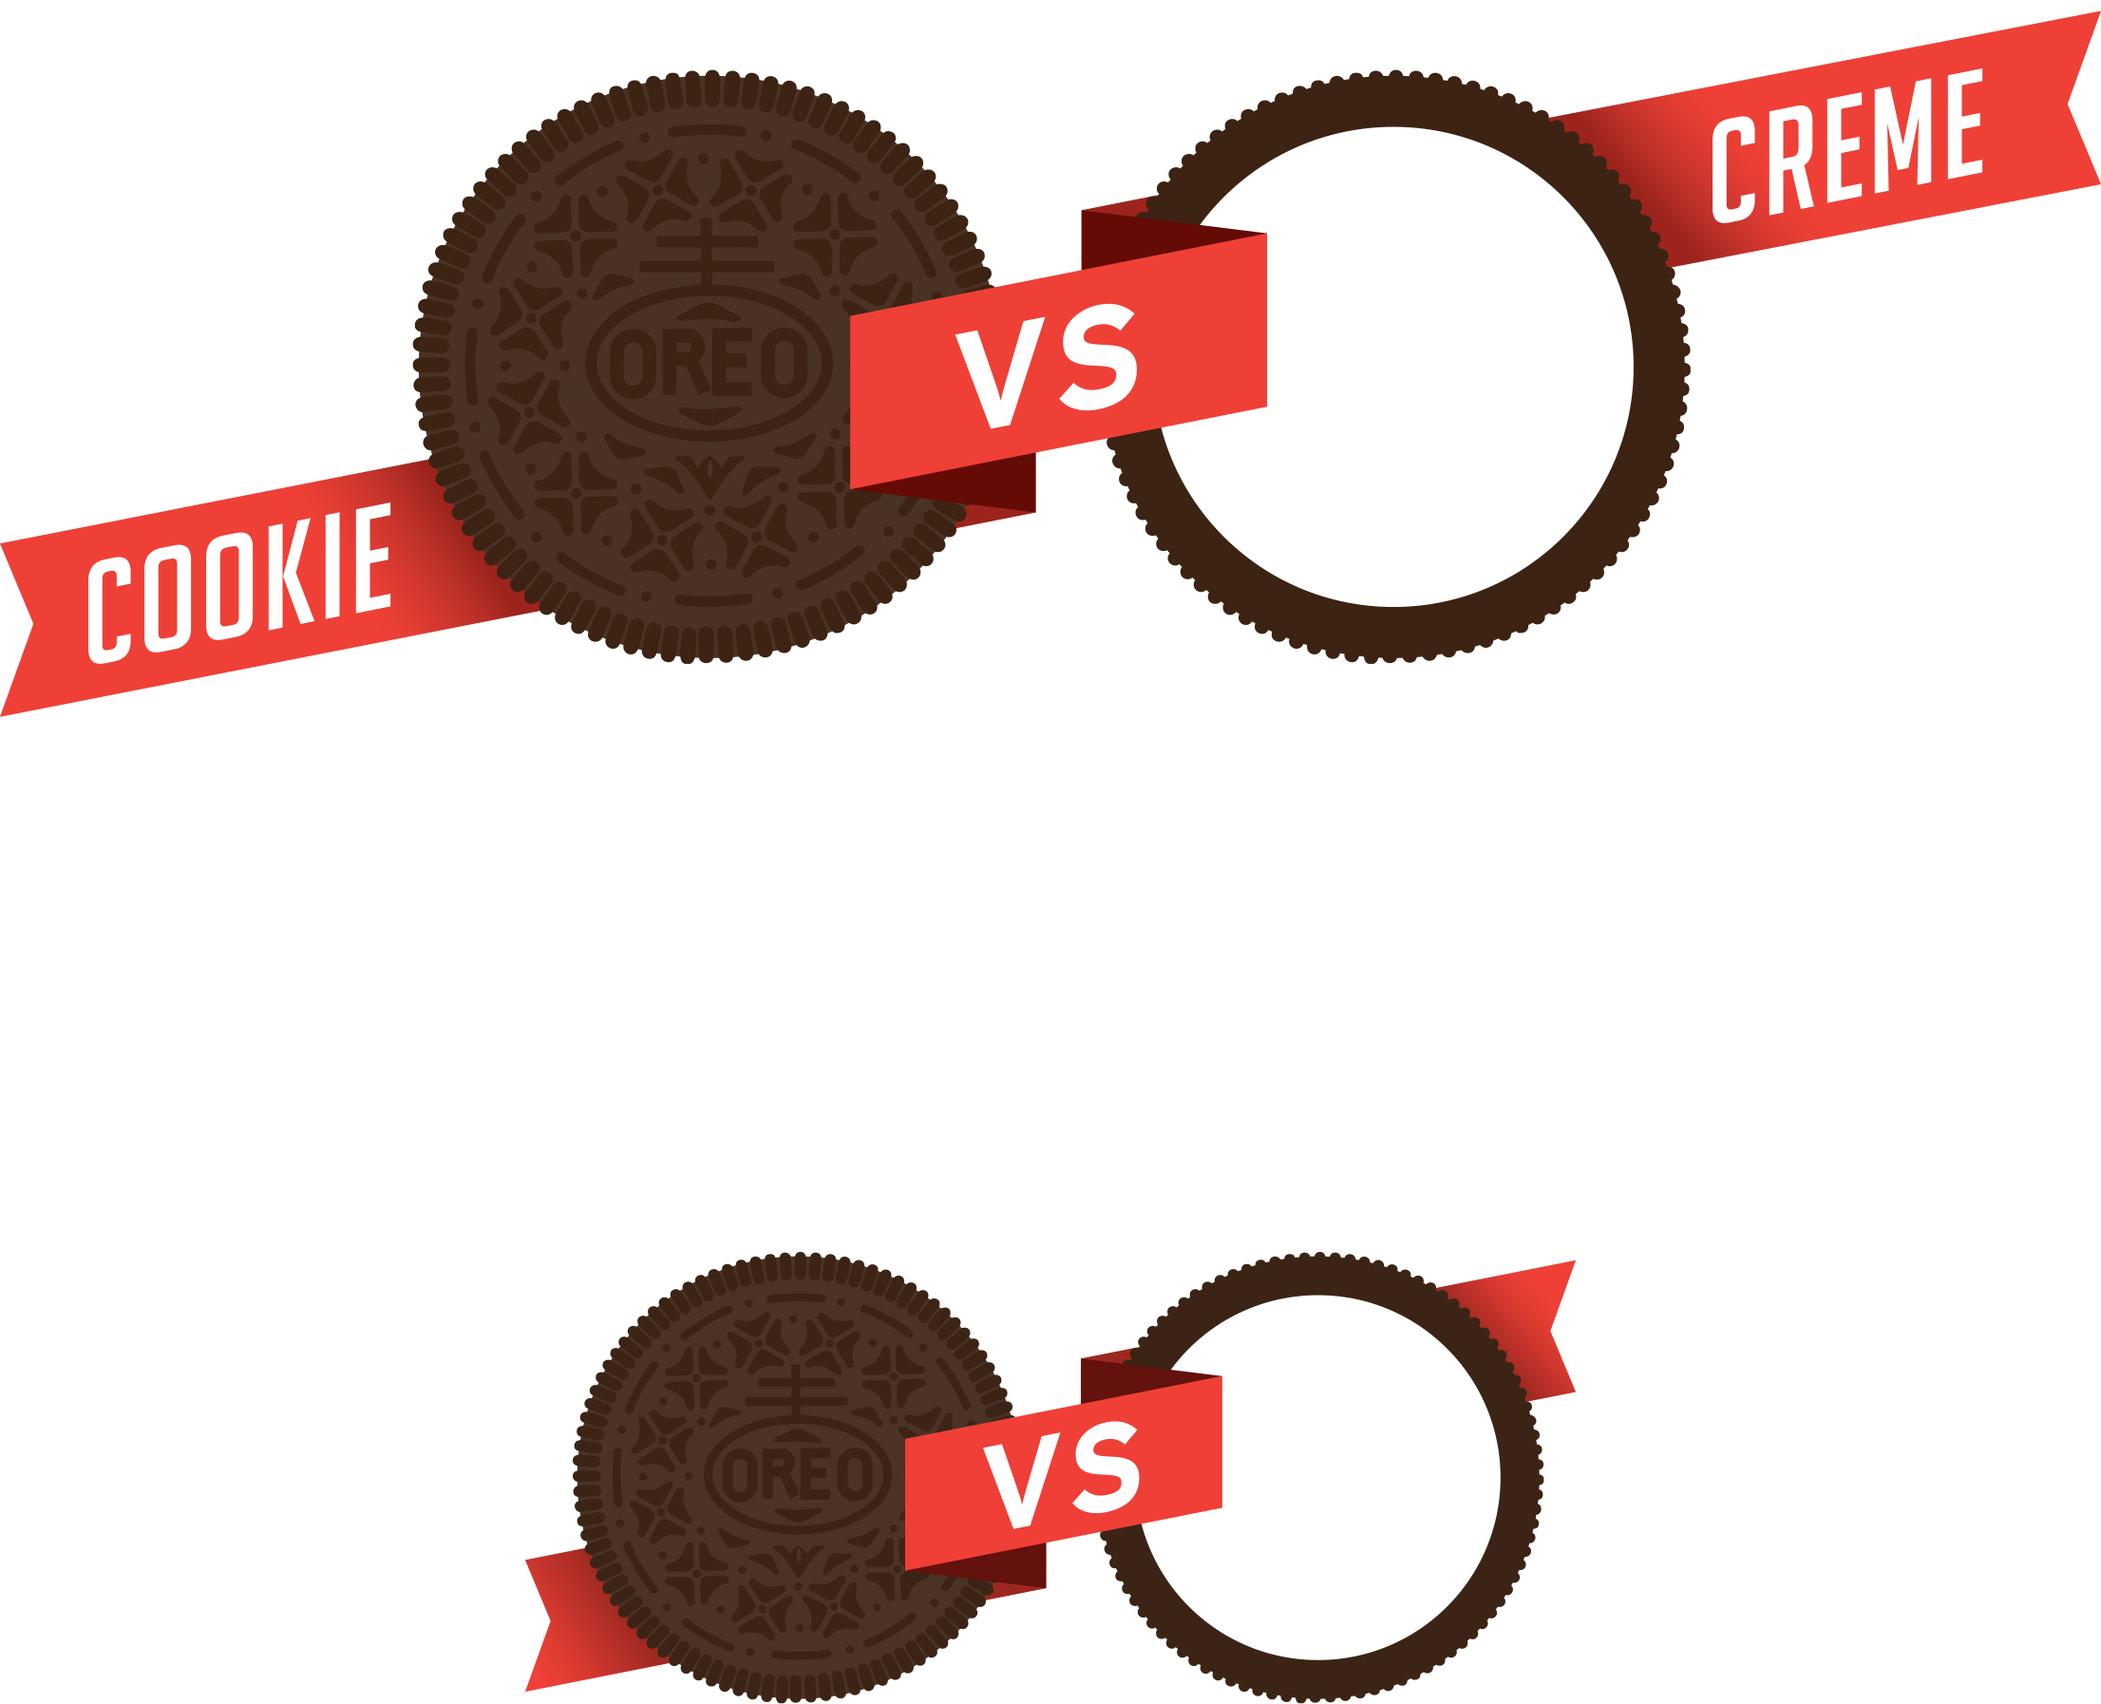 Oreo clipart oreo cookie Free ClipartBarn 4 clip clip